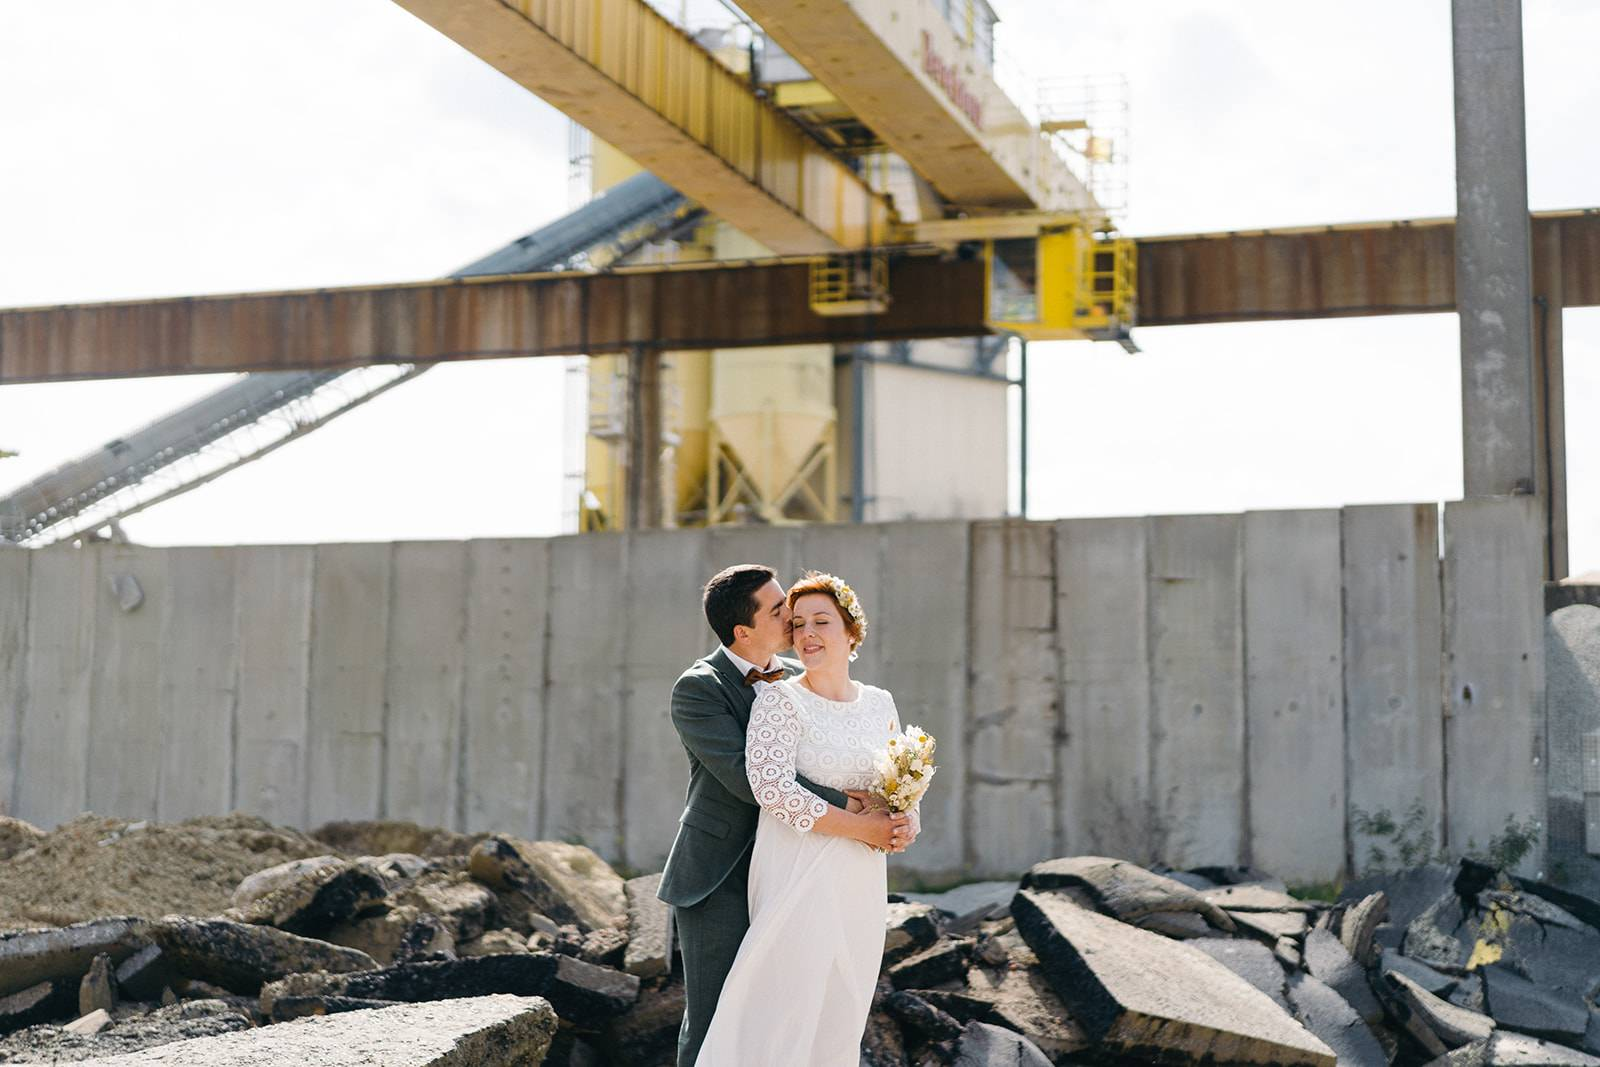 Hilde Eyckmans - CarolineSteven55mm- Hilde Eyckmans -93 - House of Weddings